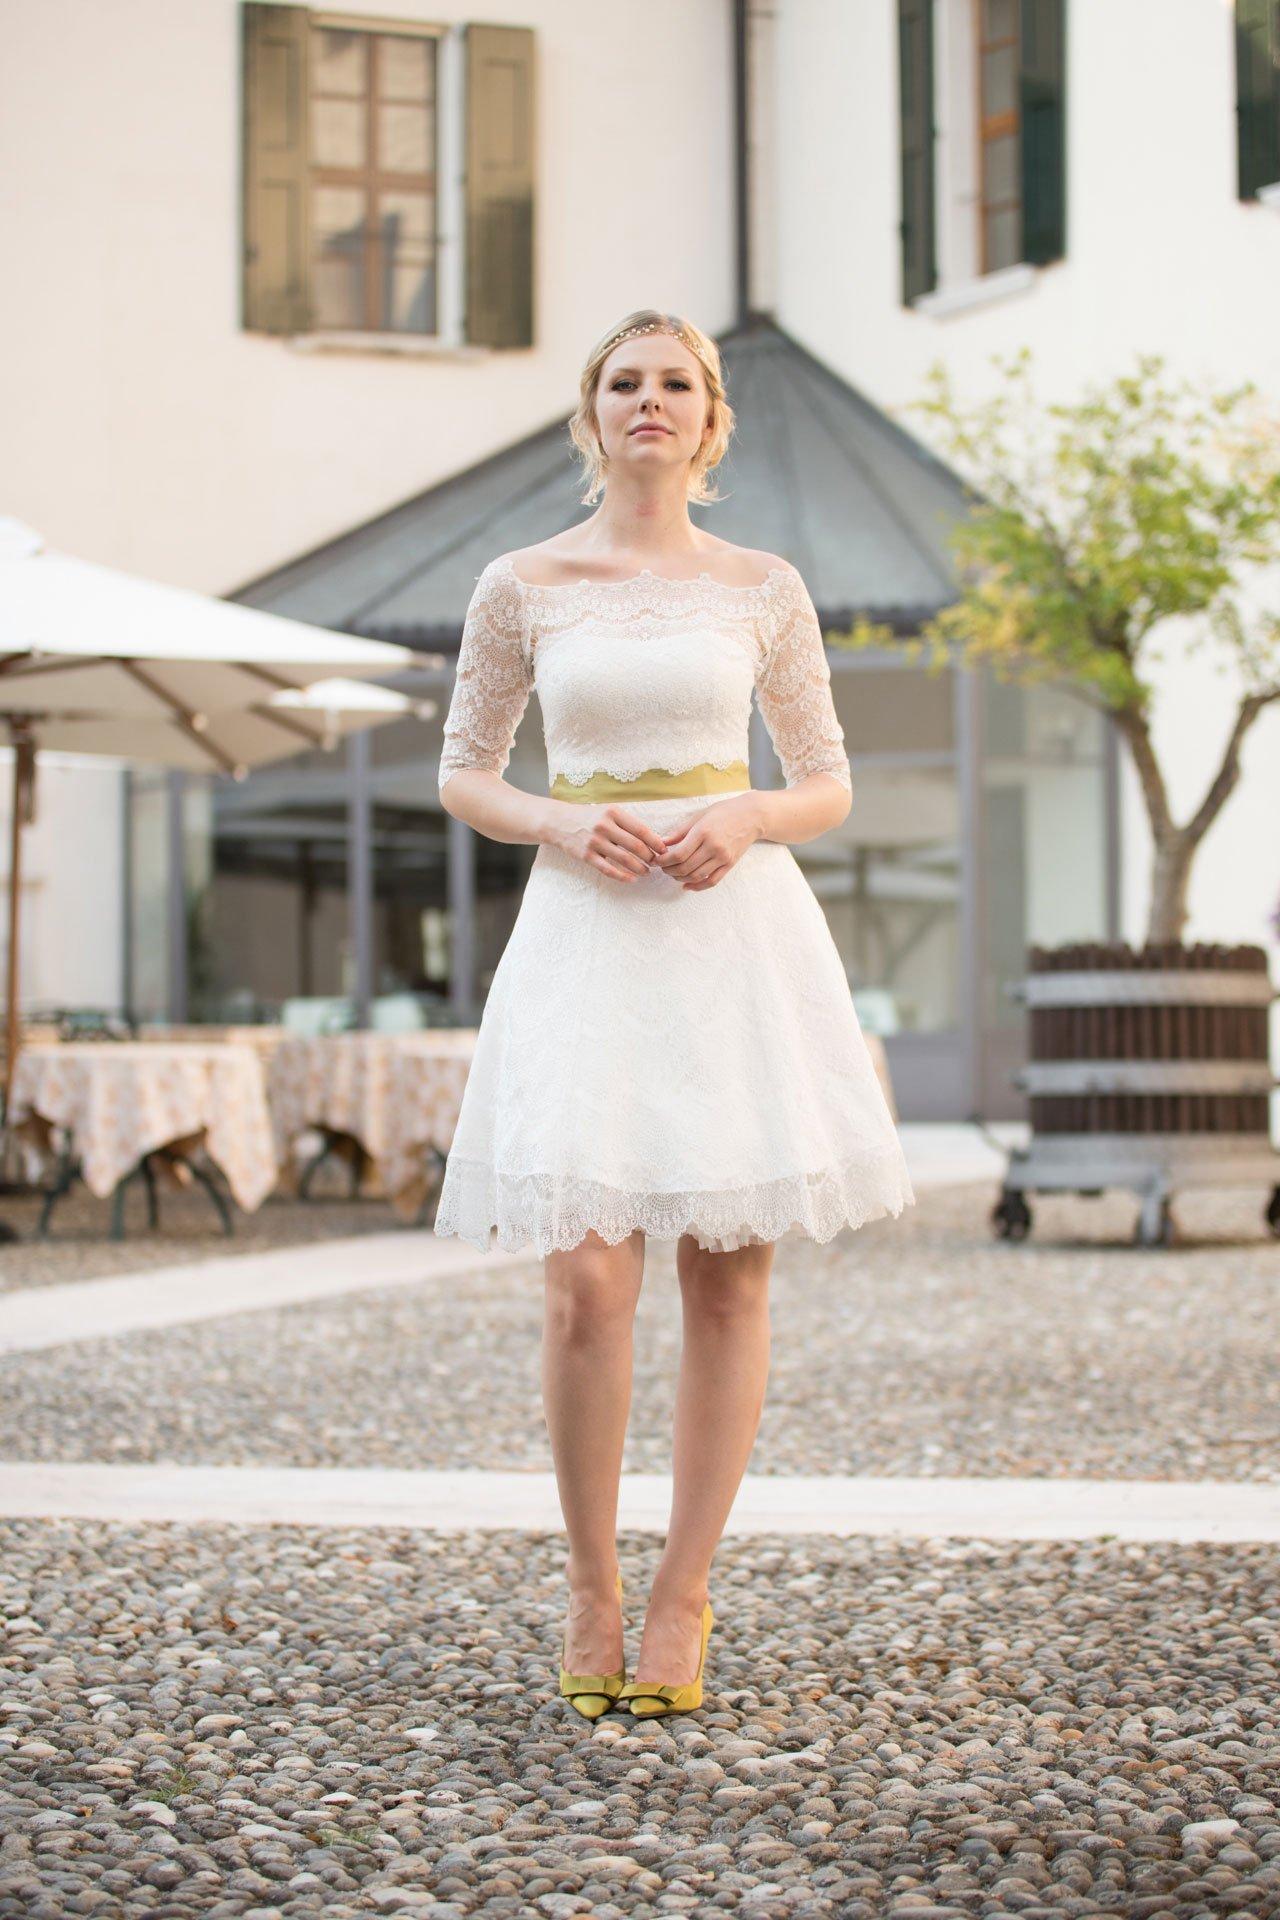 Brautkleider kurz 2018